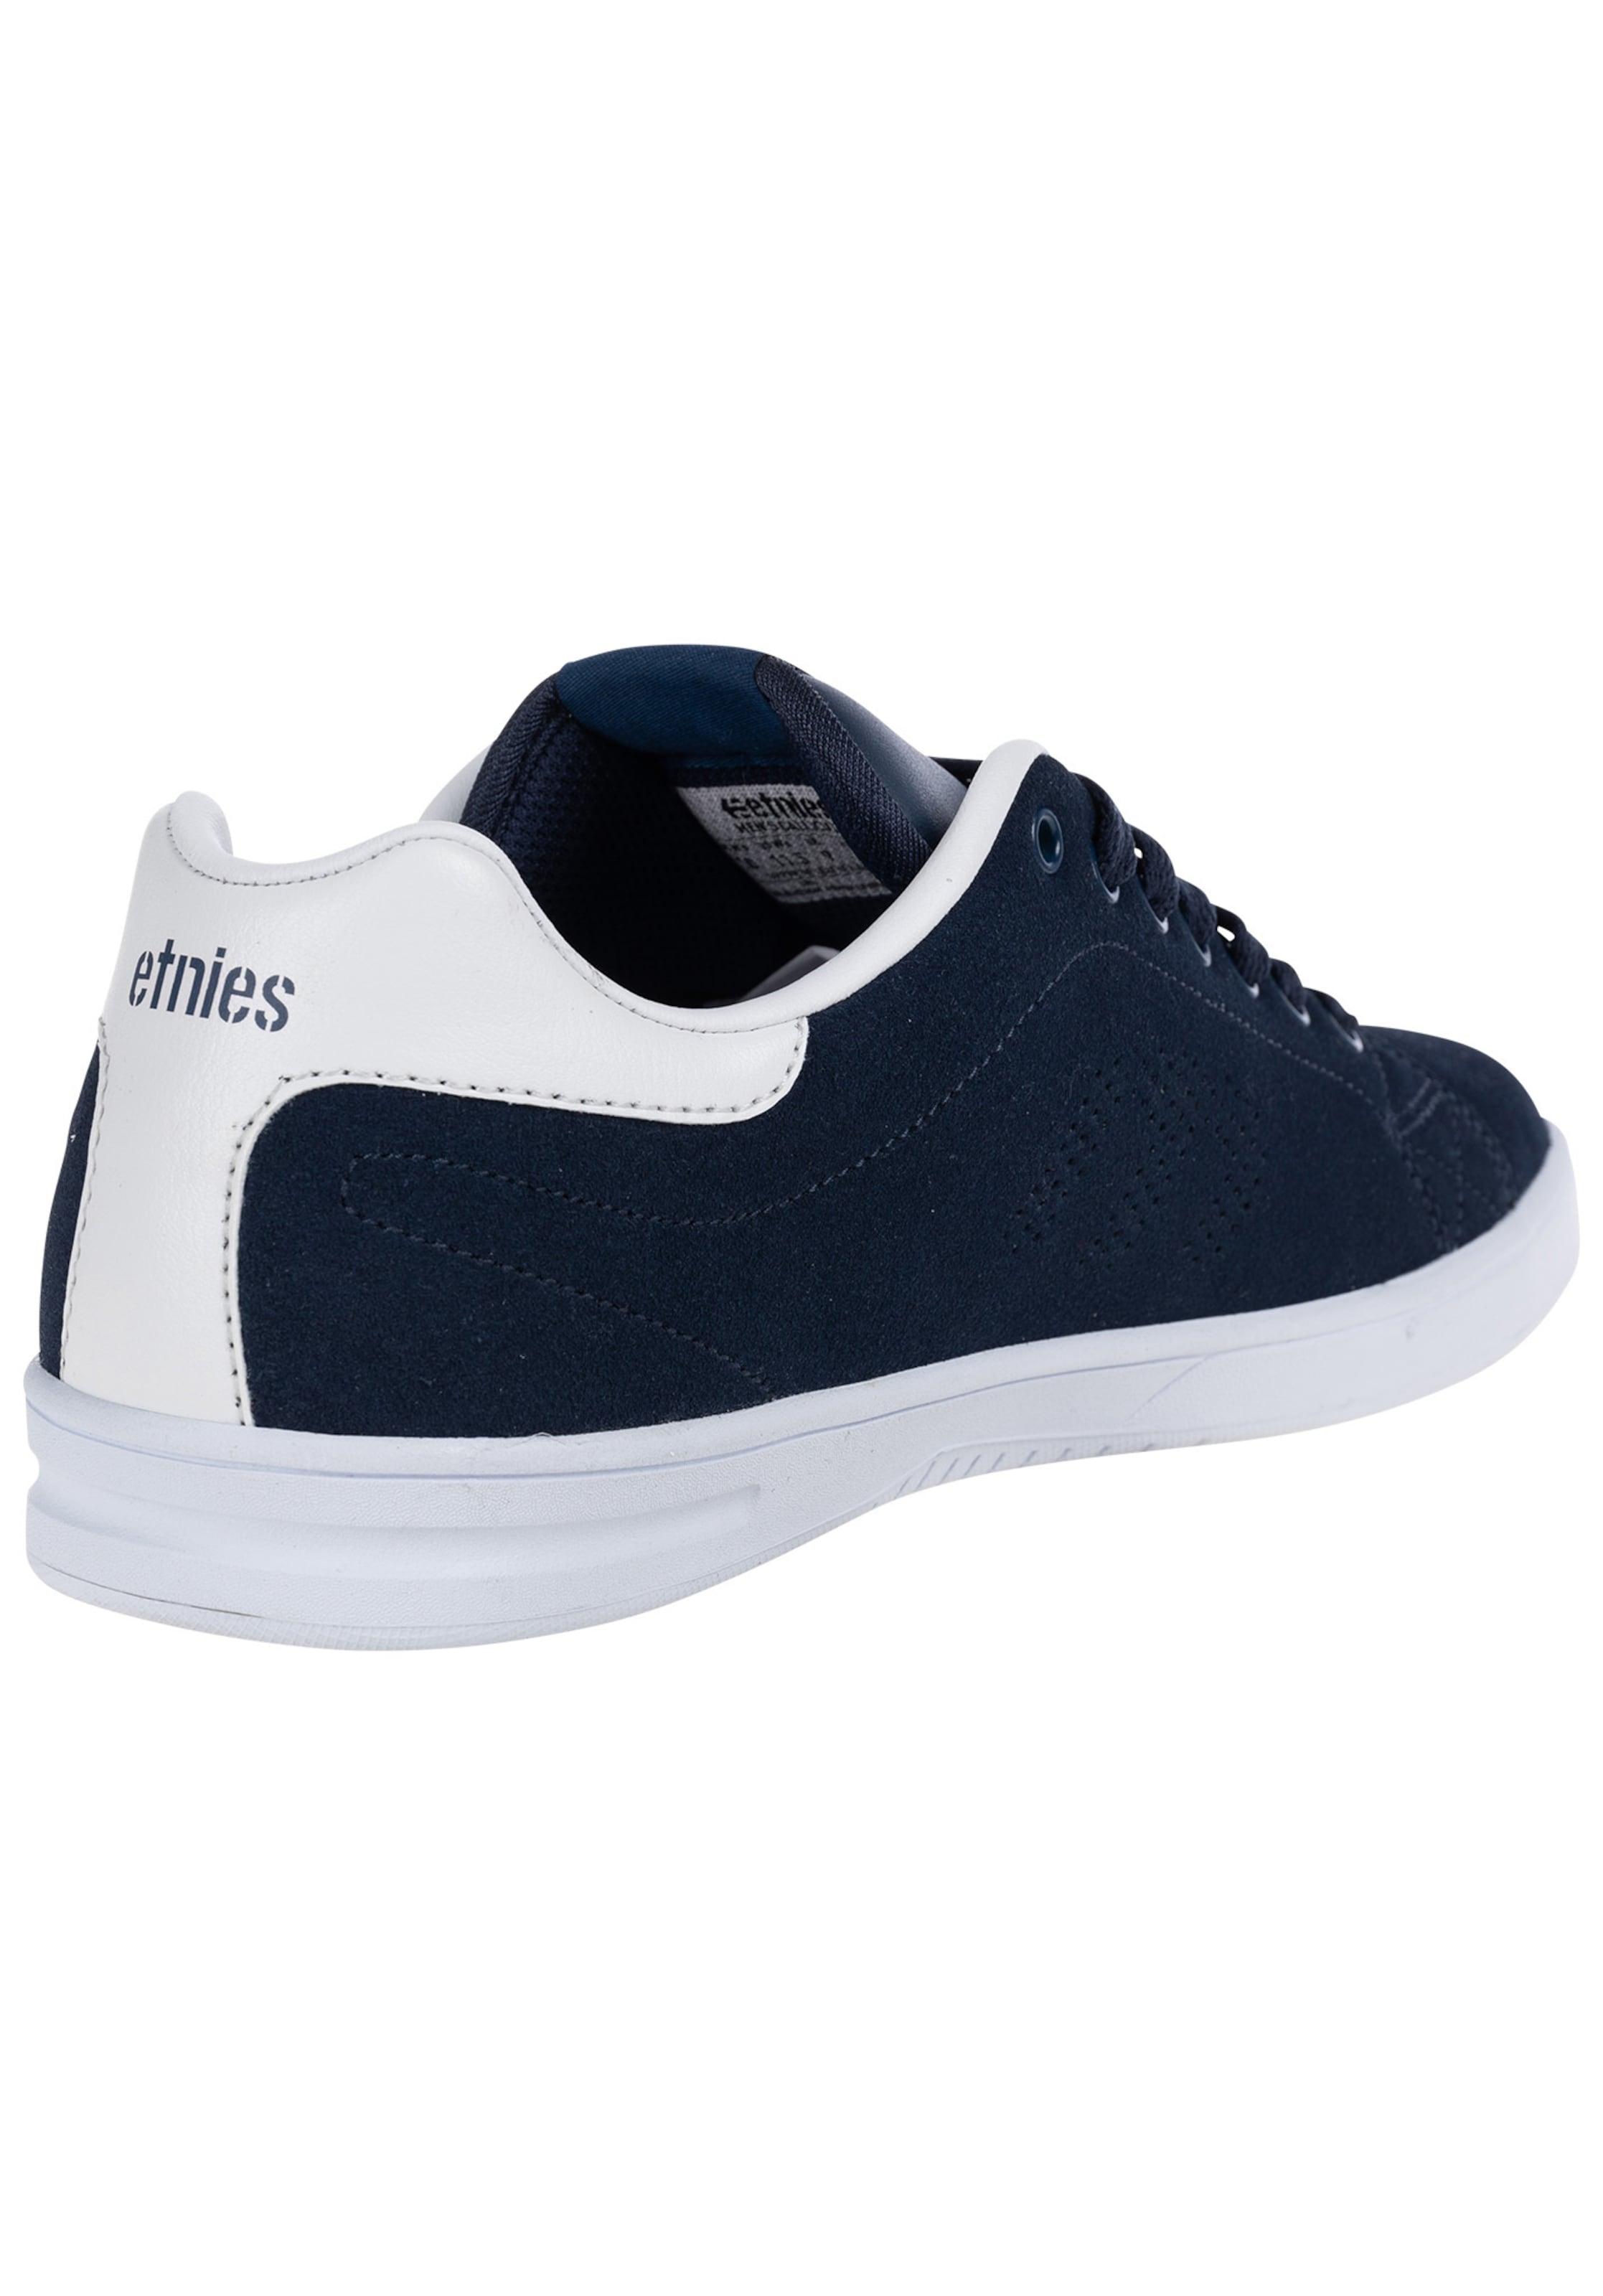 Etnies Sneaker Sneaker NachtblauWeiß 'callicut' Etnies 'callicut' In In NachtblauWeiß Etnies xrBWdoeC